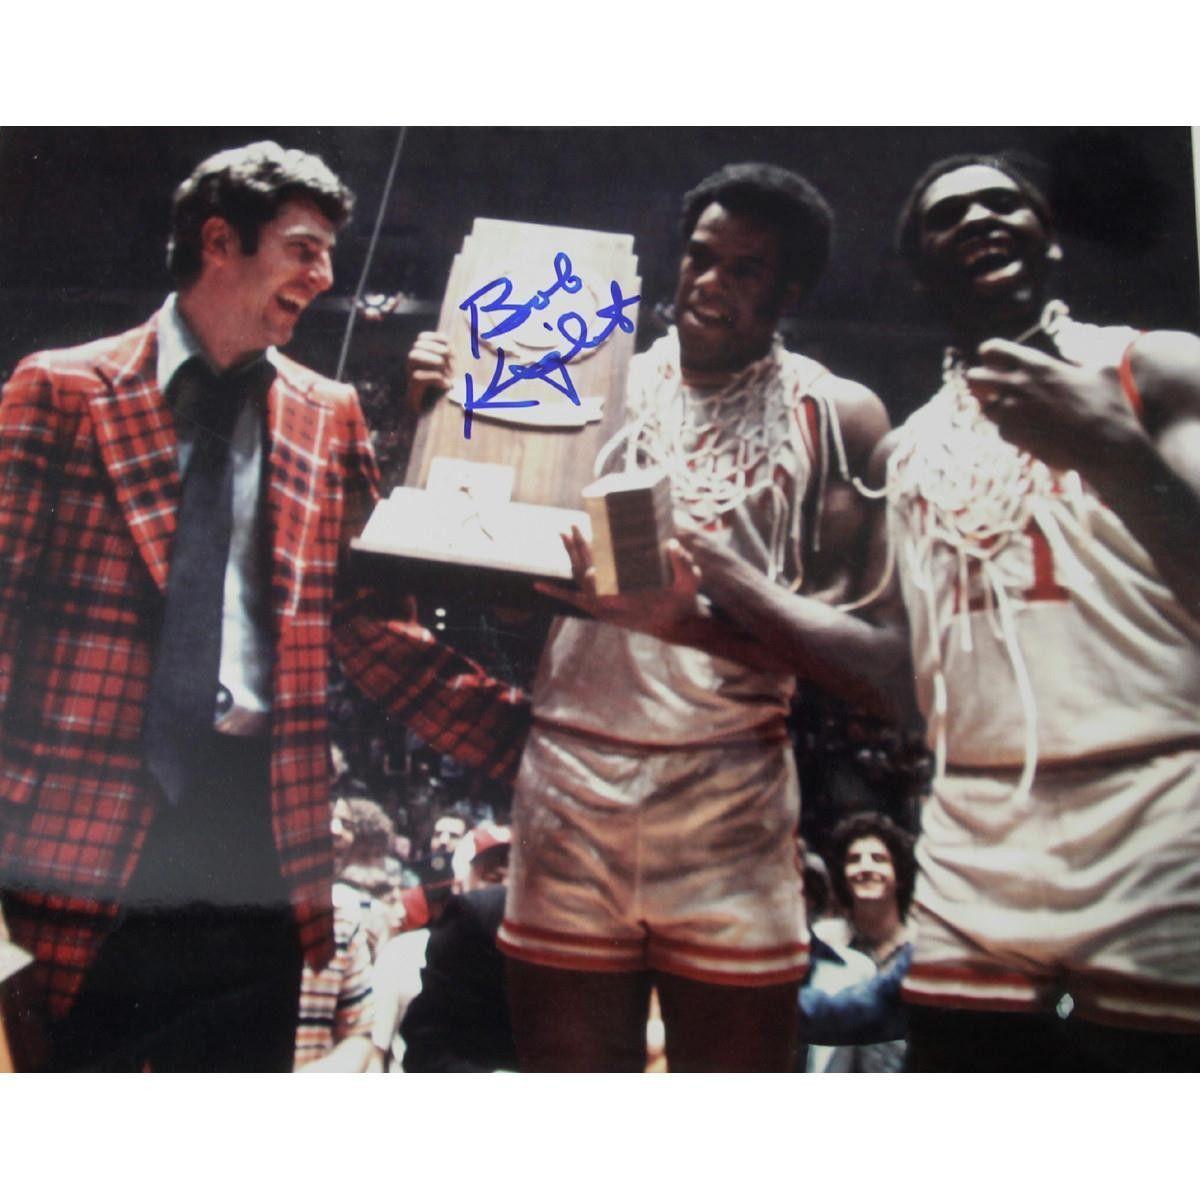 Bob Knight Signed 8x10 W Trophy Bob knight, Coach of the